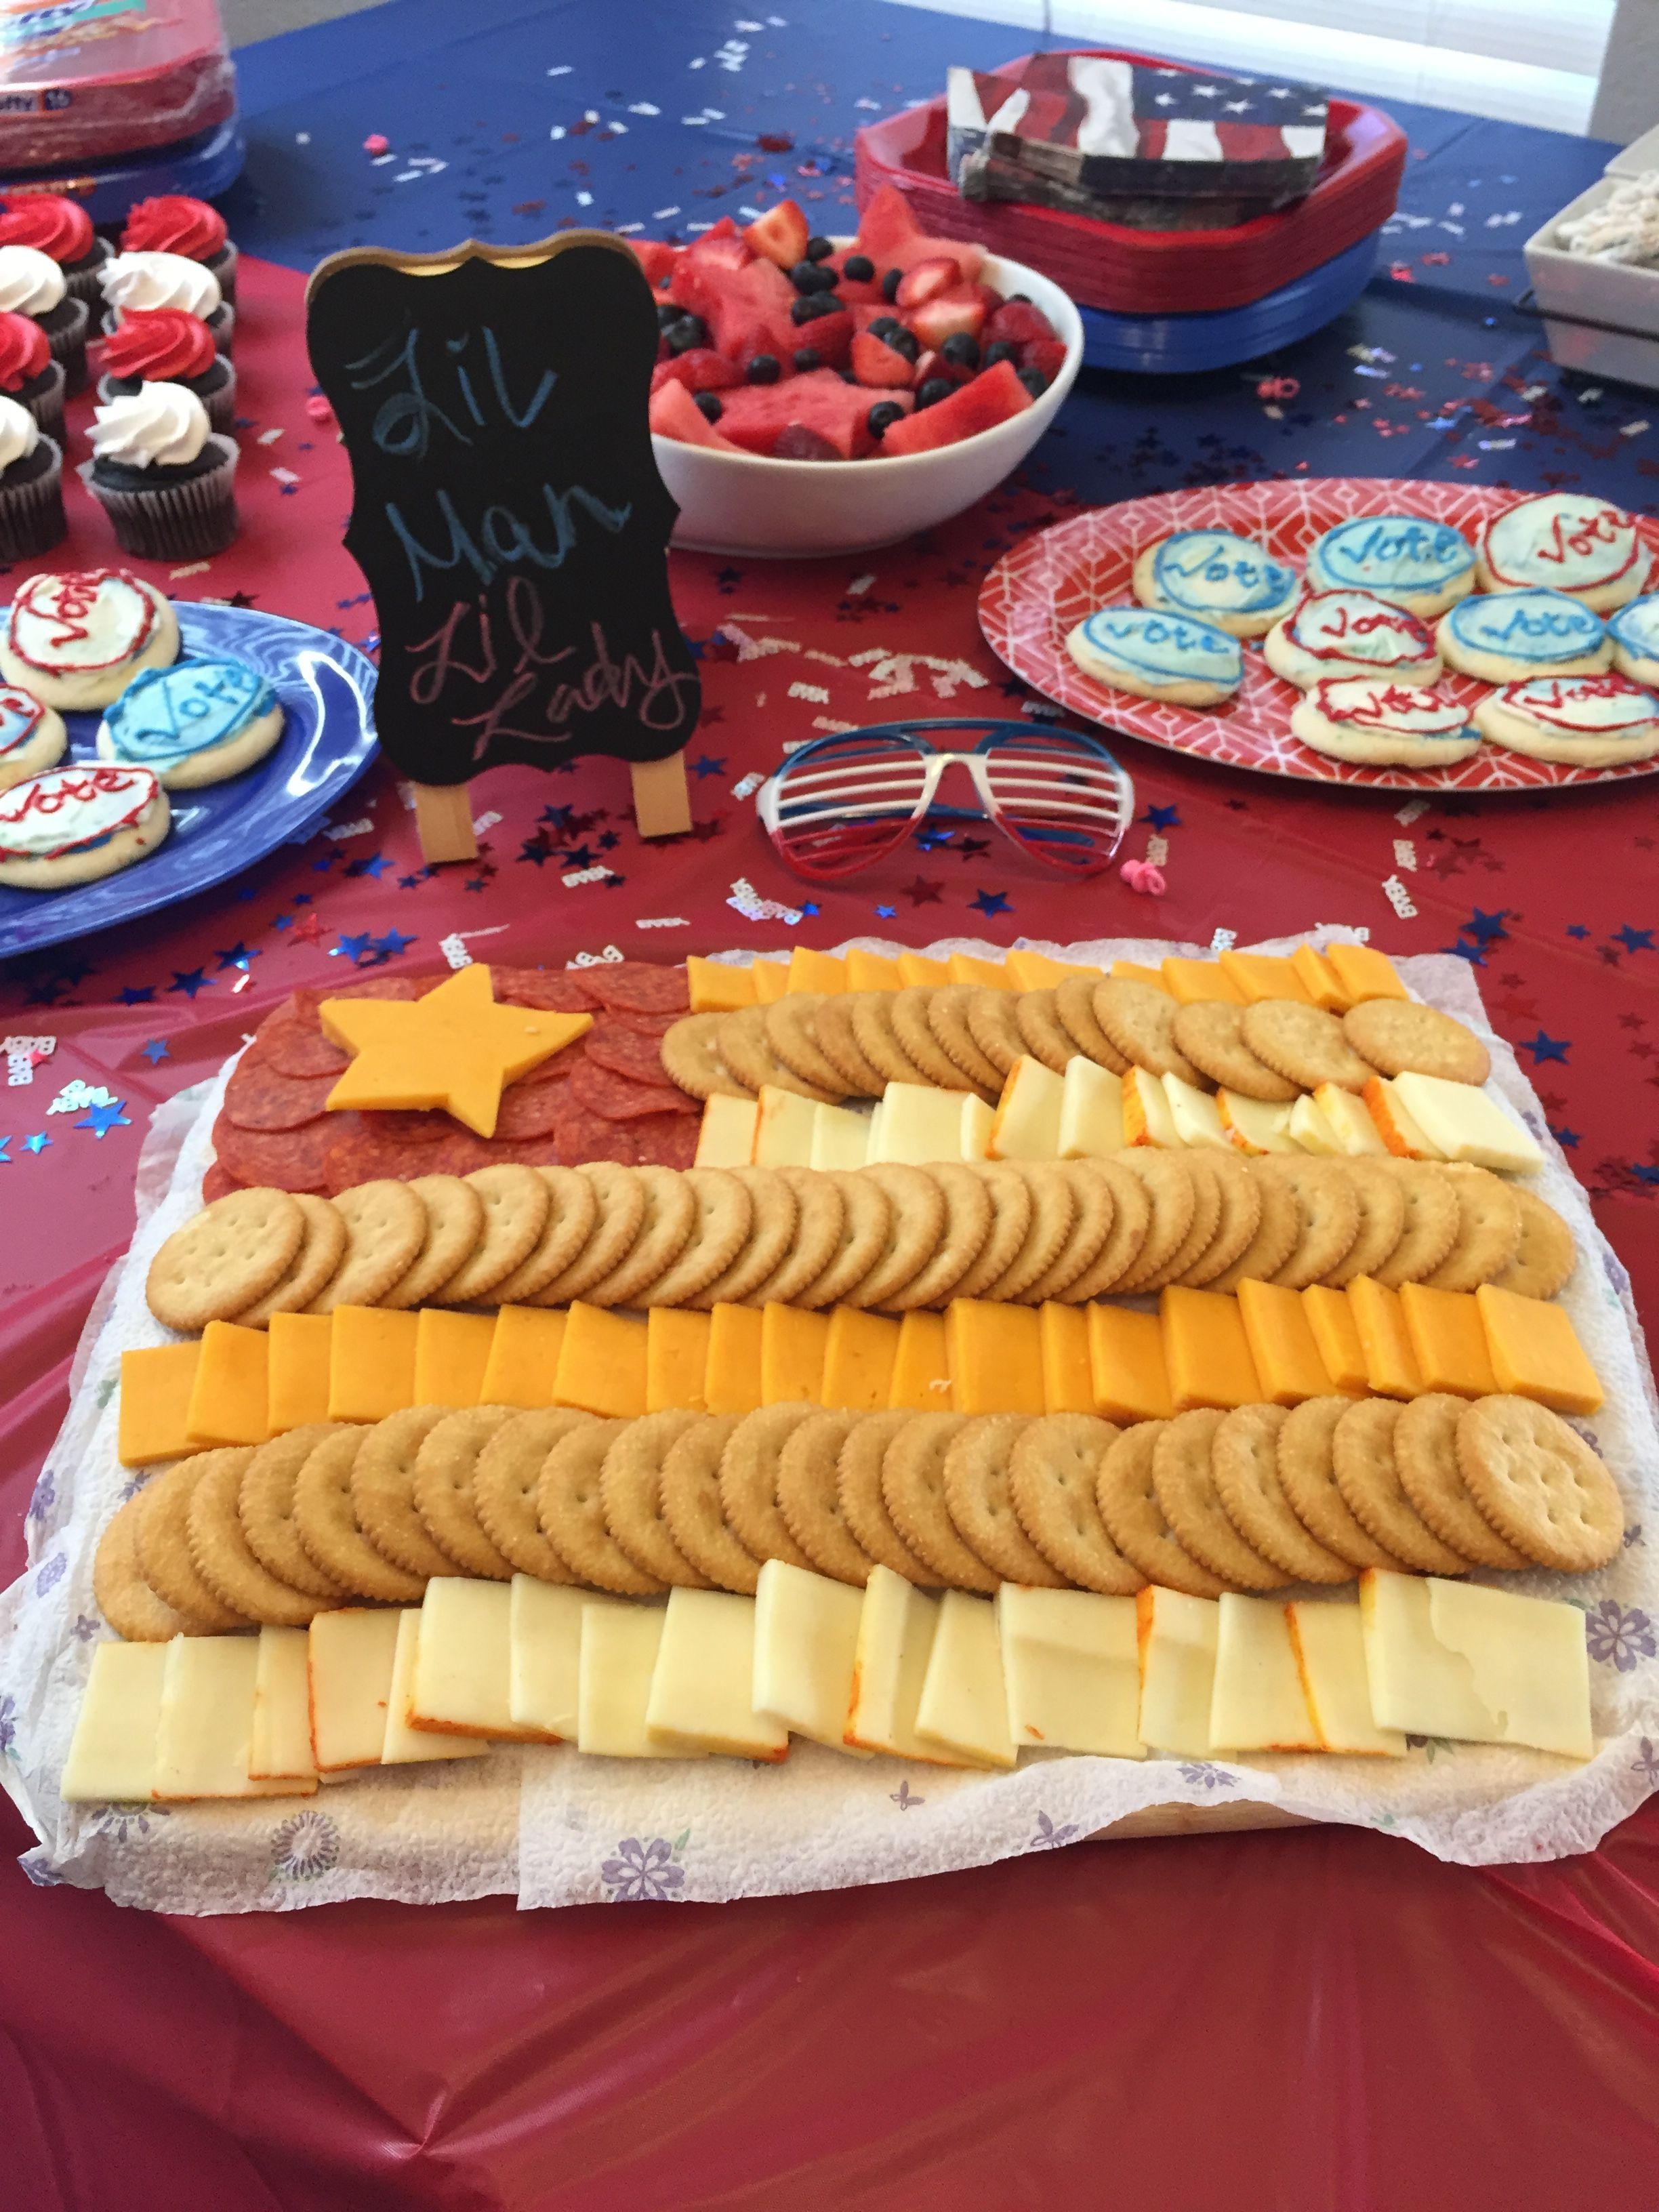 Gender Reveal Finger Foods 4Th Of July Themed